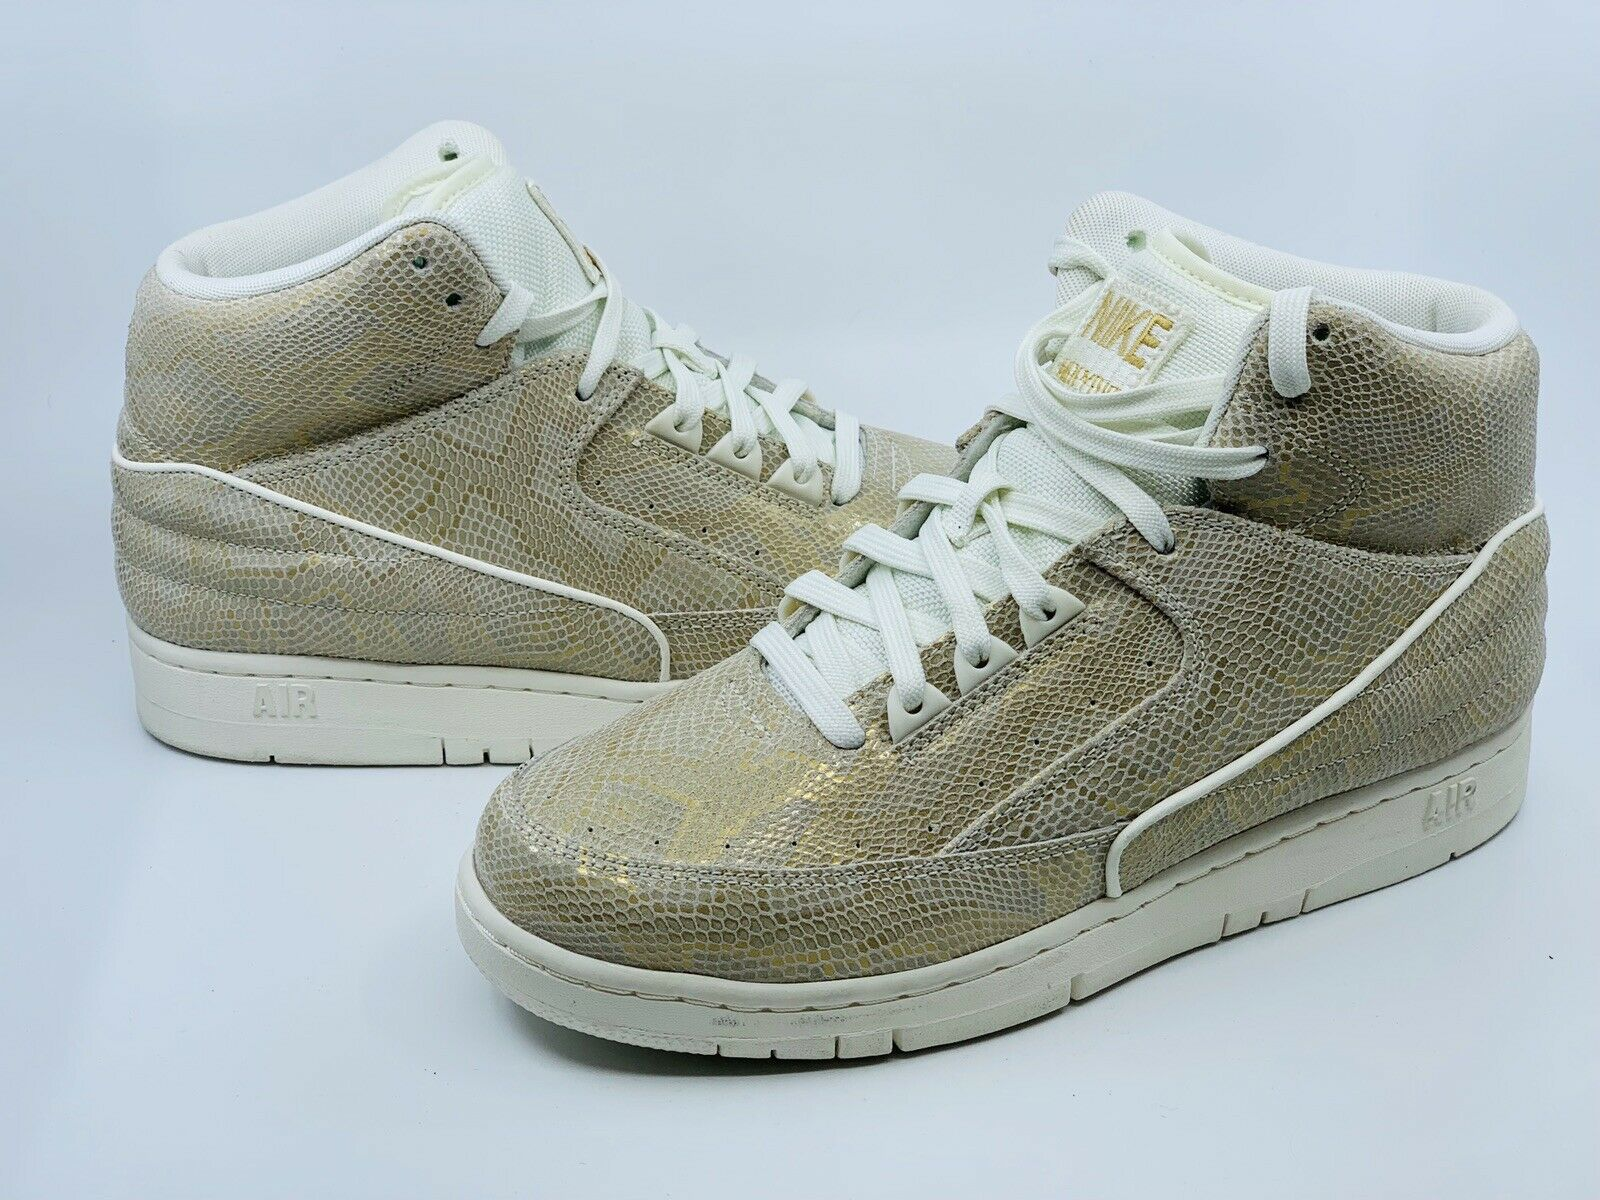 new product 37d6f fdadd Nike Air Men s Men s Men s Python Premium Sail gold Snakeskin shoes 705066-102  Sz 8